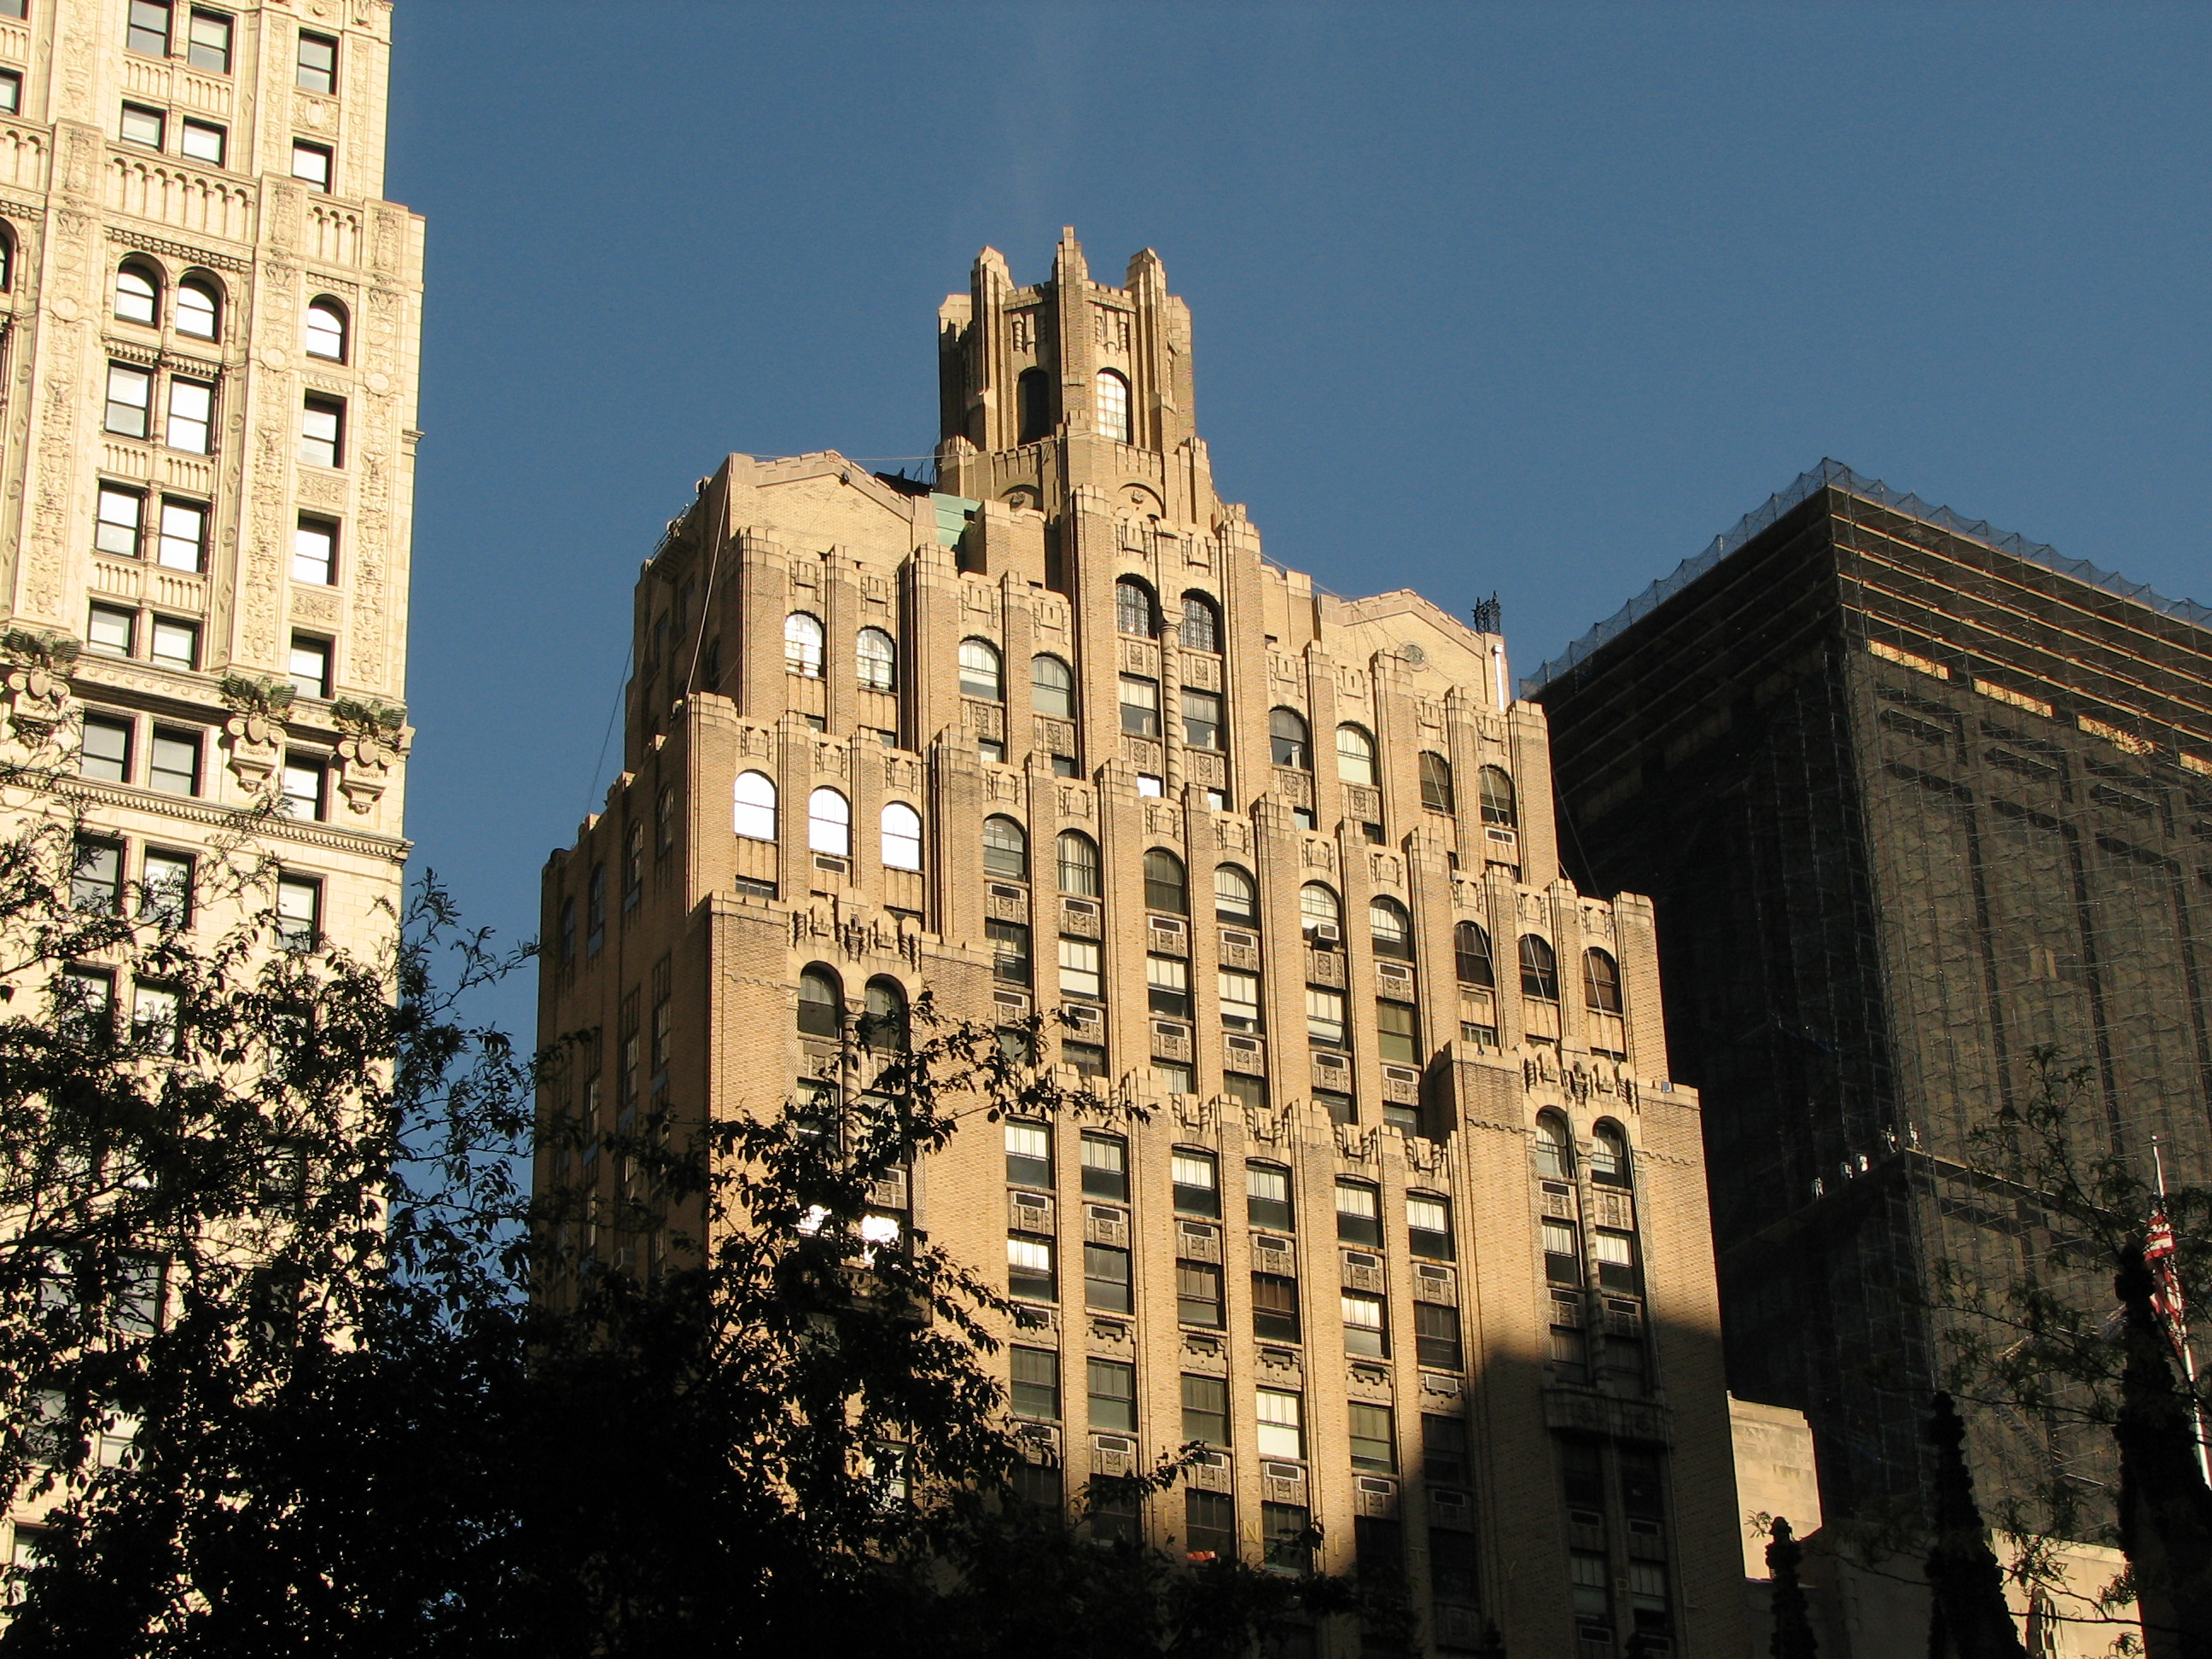 Description new york city building in financial district